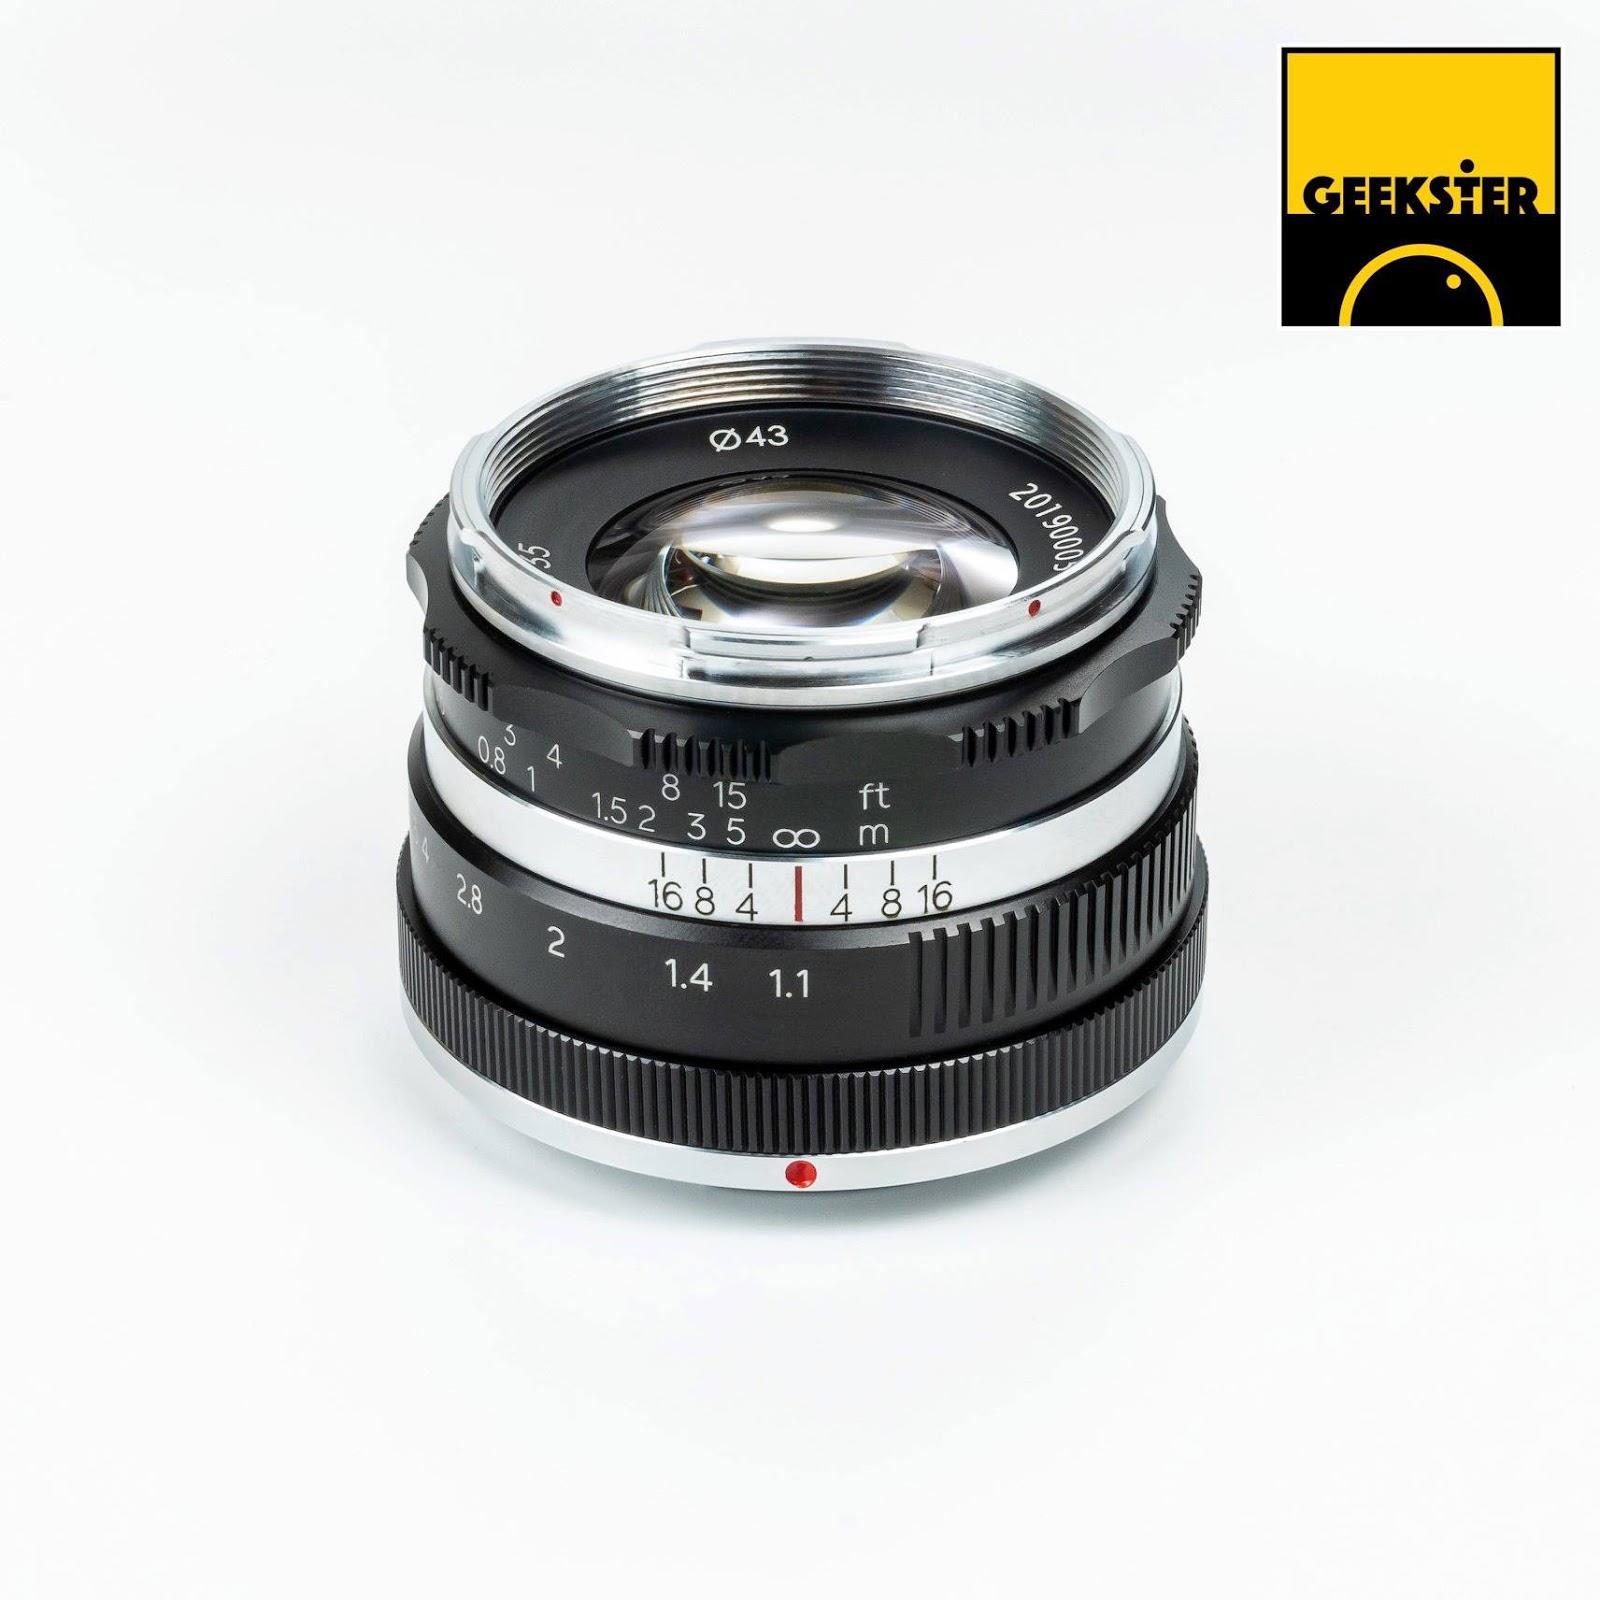 Объектив Geekster 35mm f/1.1